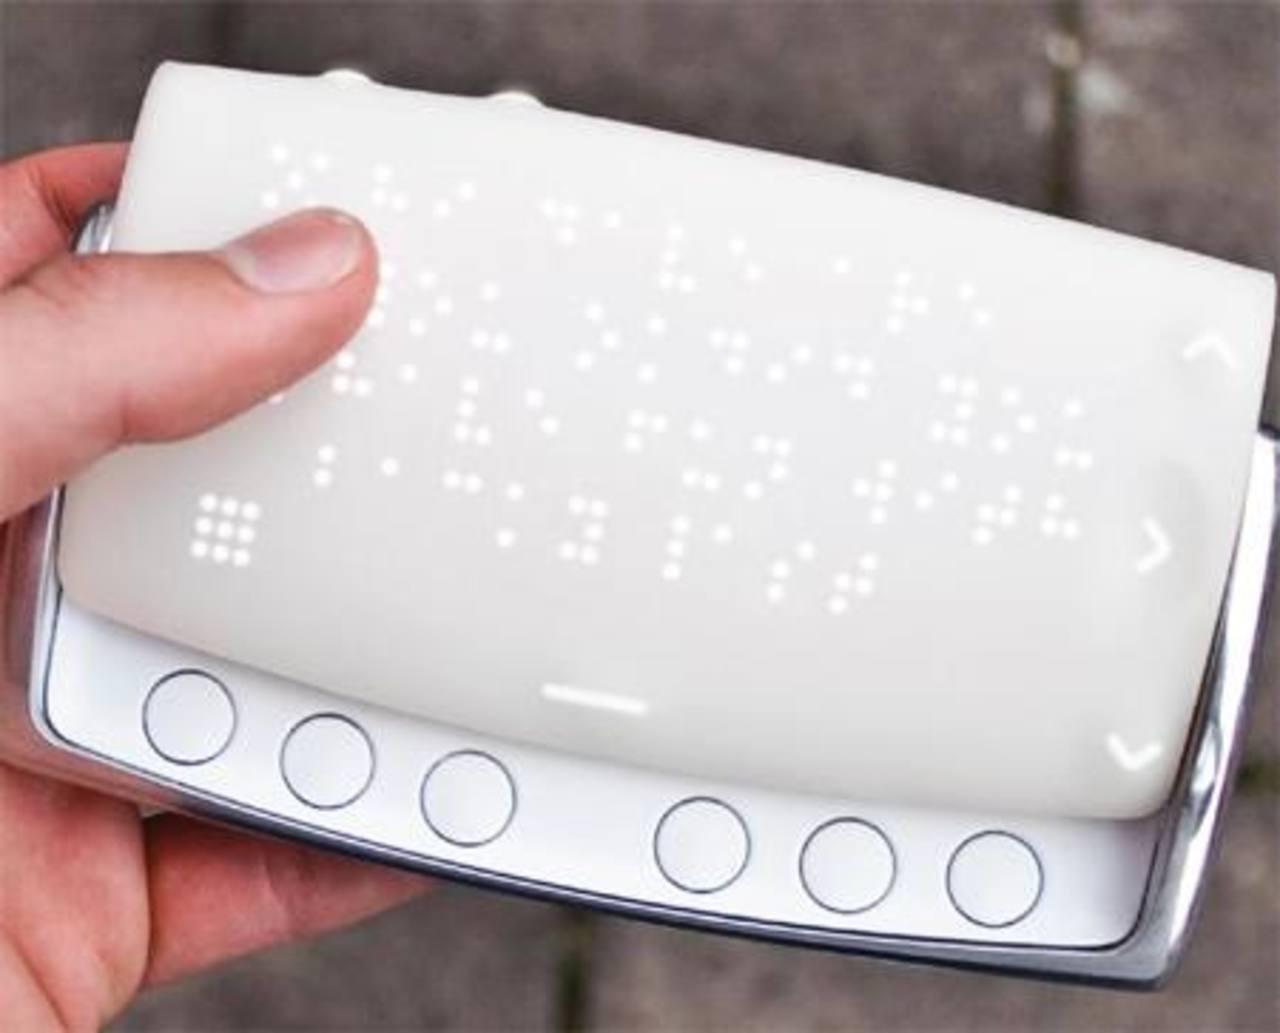 Braille Phone, primer teléfono inteligente para invidentes